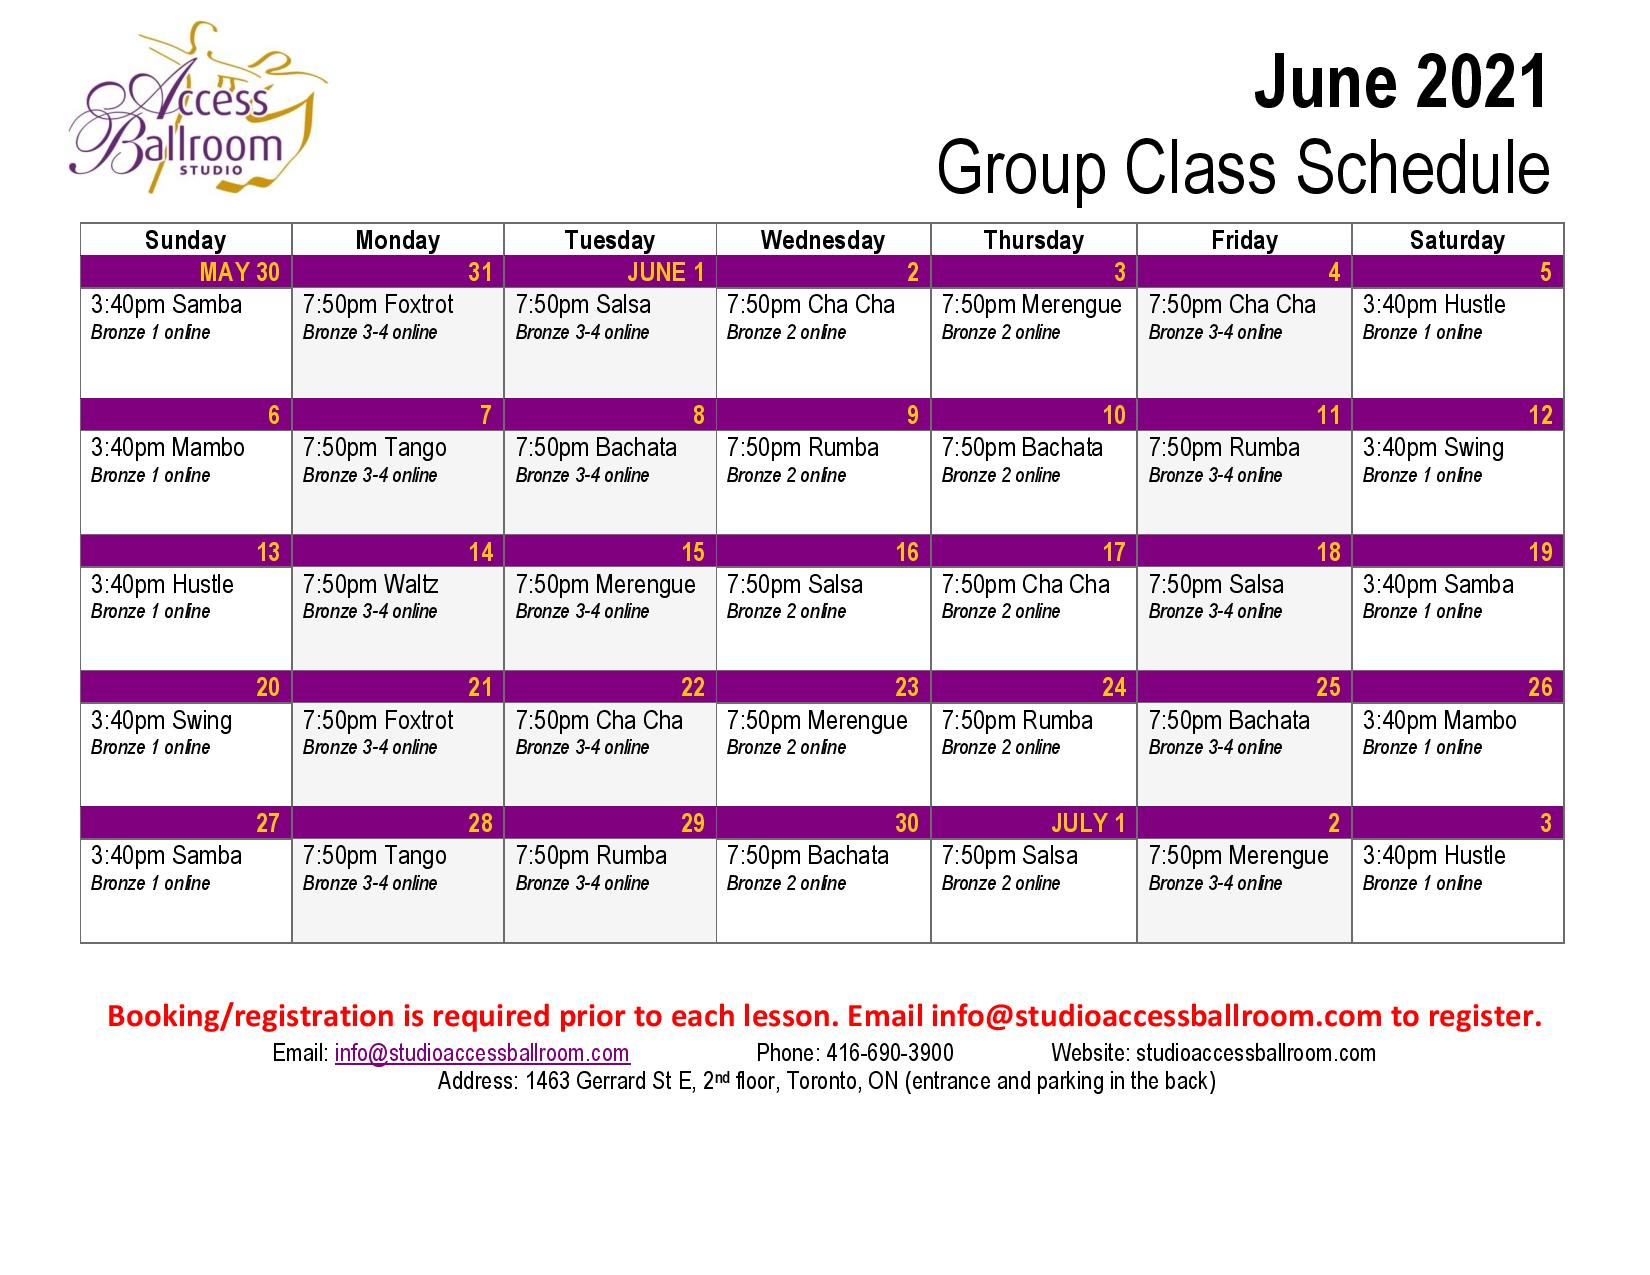 Access Ballroom June 2021 schedule